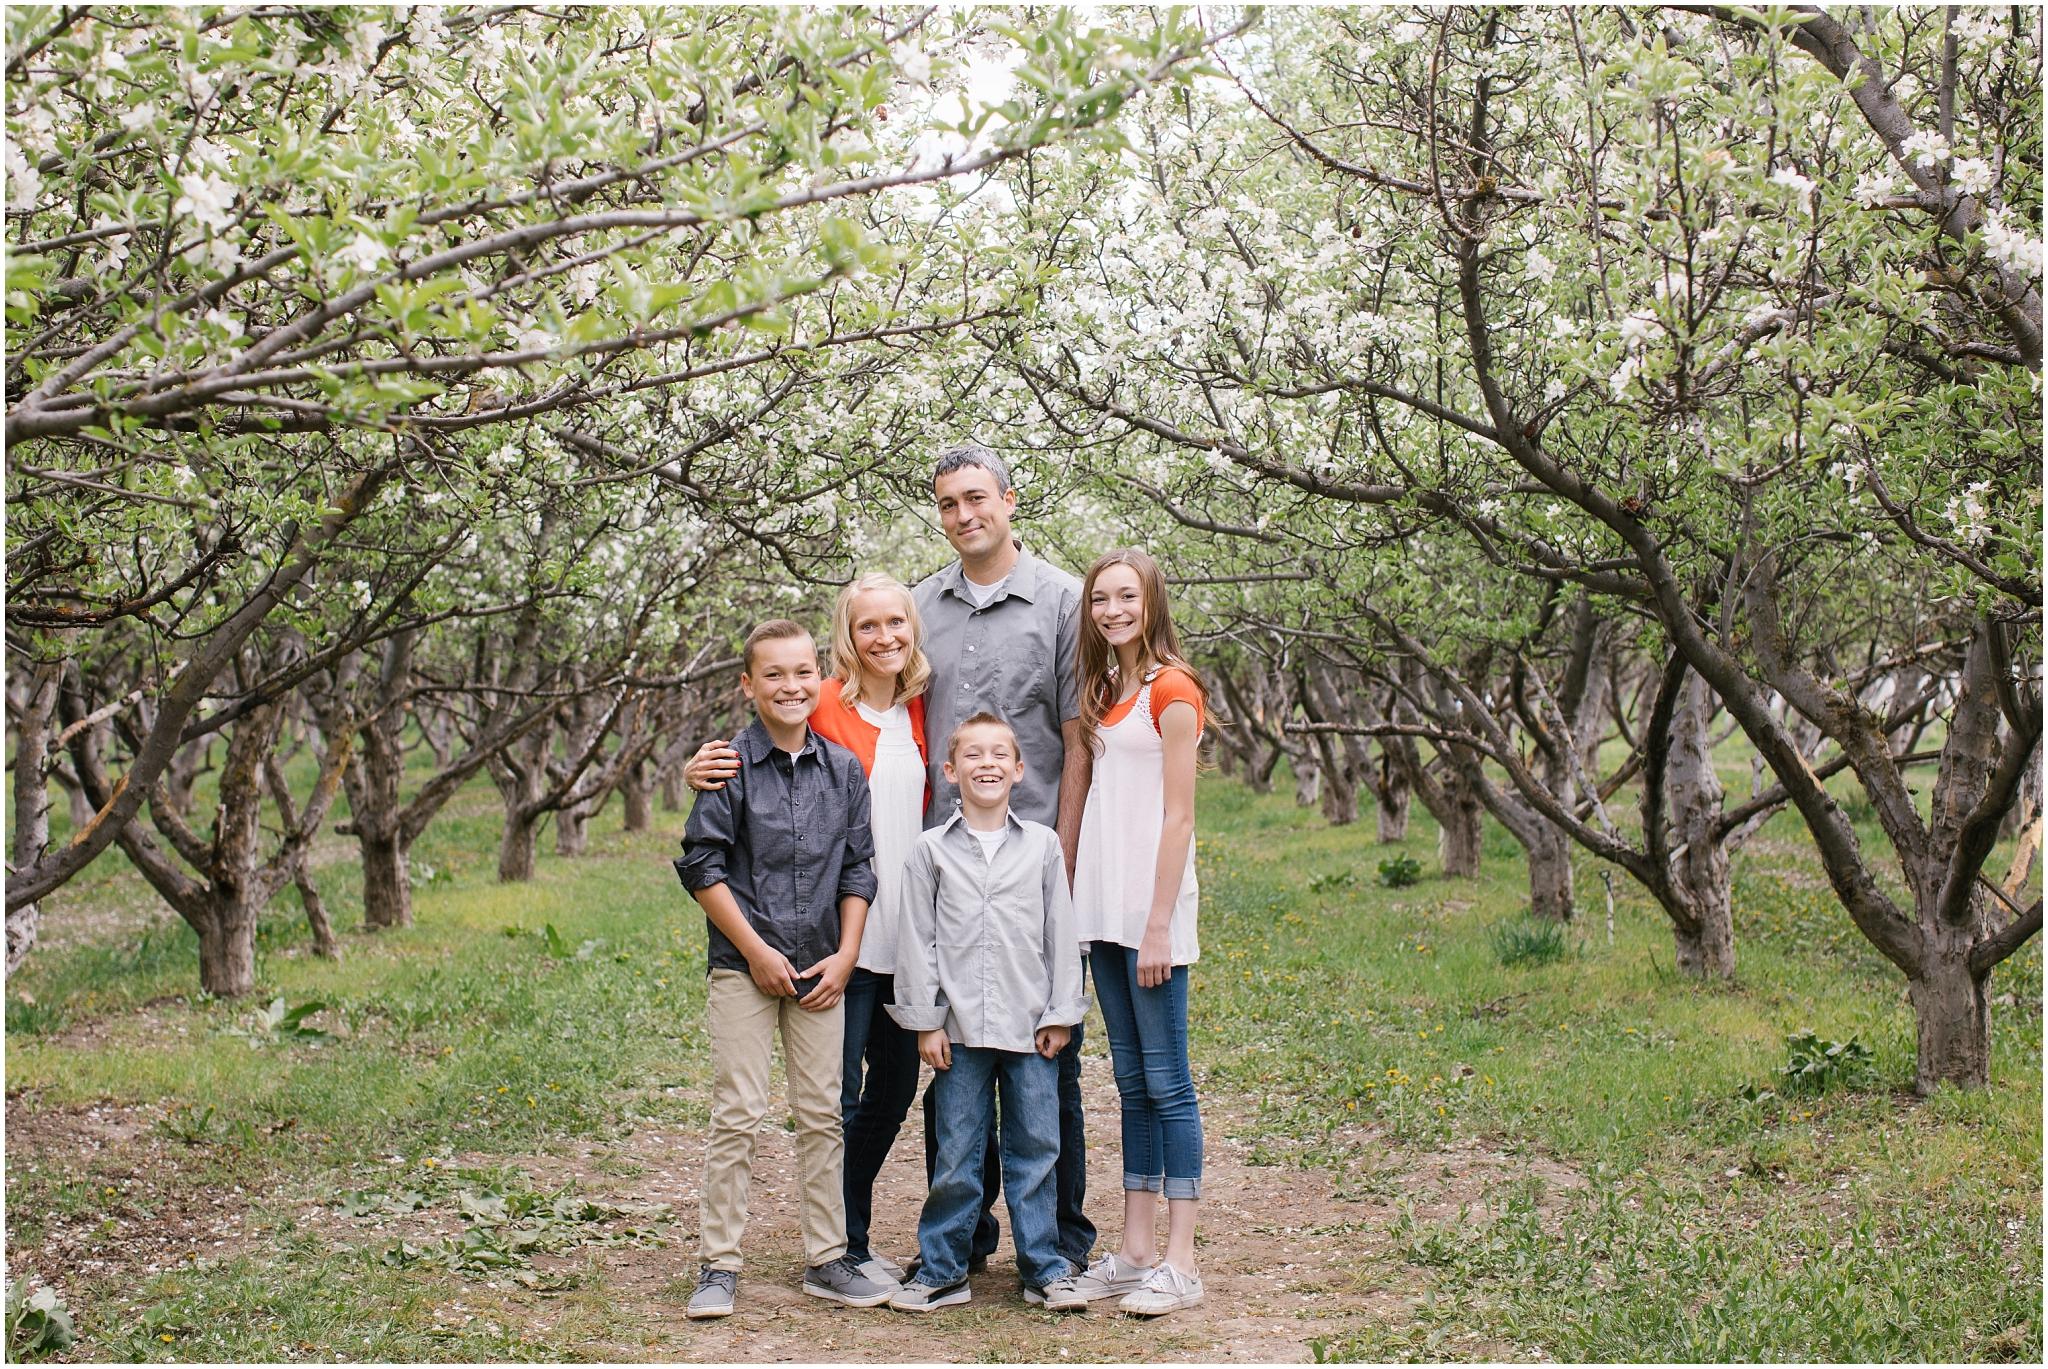 Millar-24_Lizzie-B-Imagery-Utah-Family-Photographer-Salt-Lake-City-Park-City-utah-state-hospital.jpg